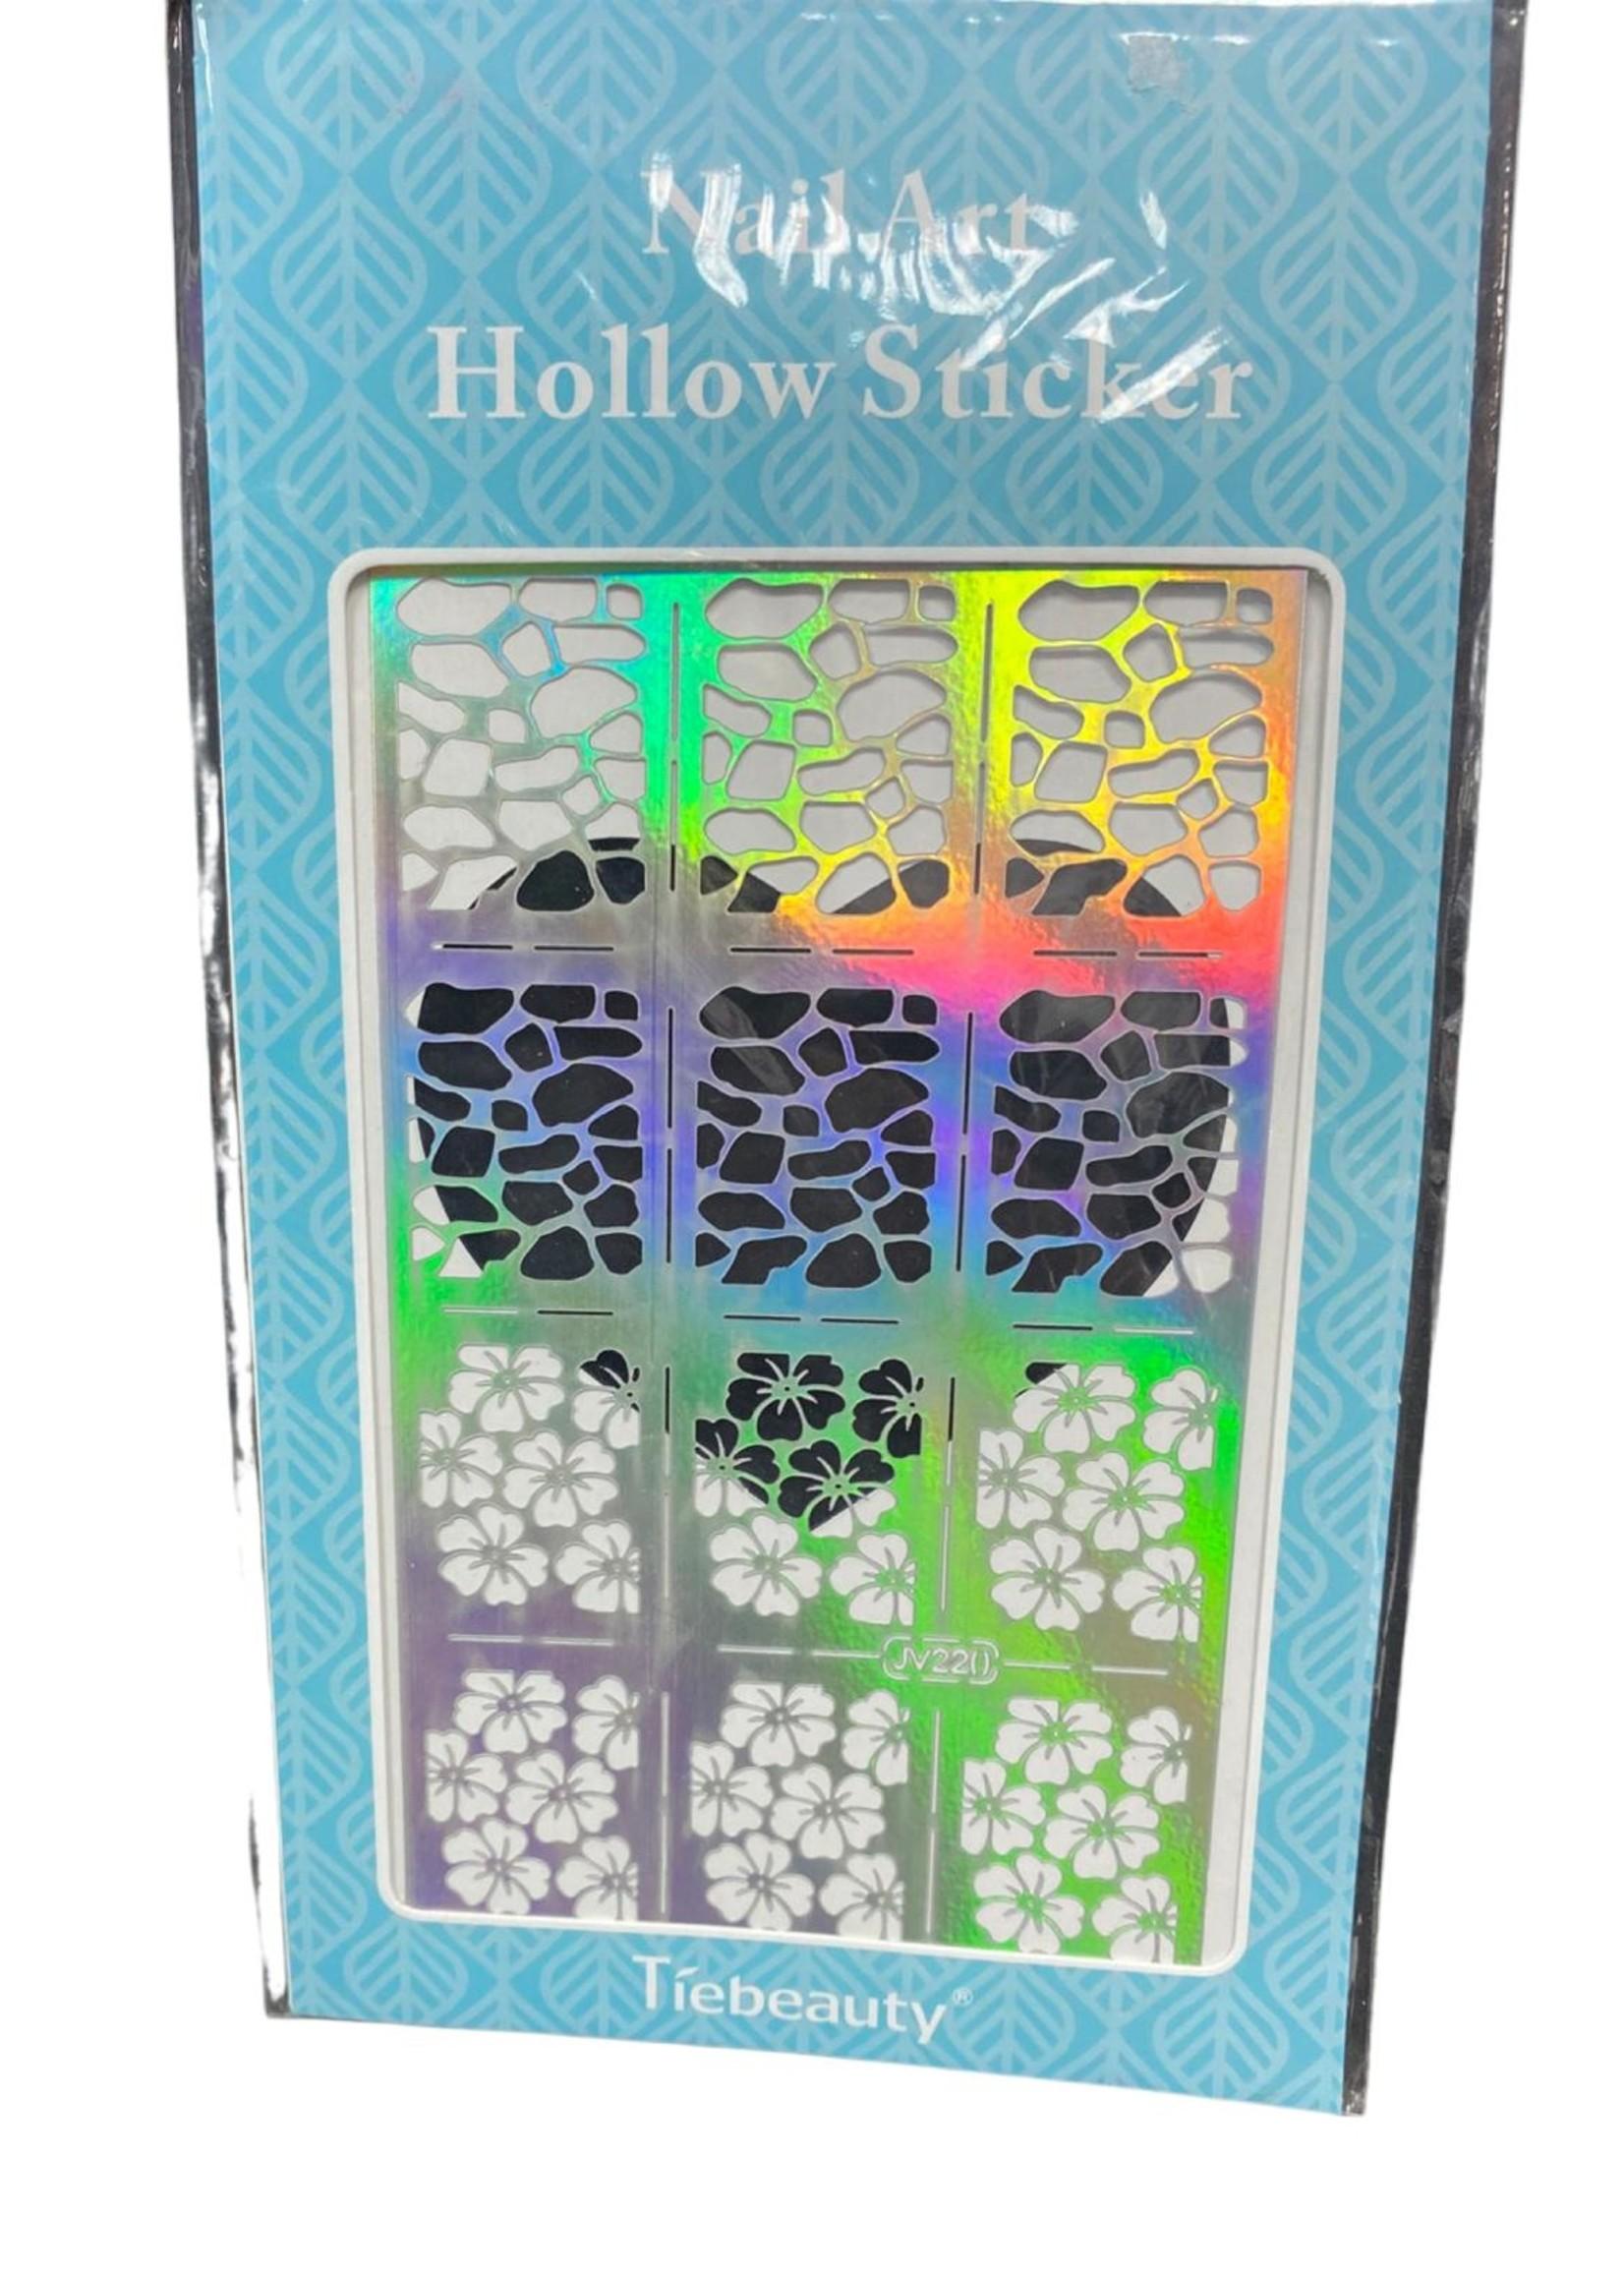 Hollow Sticker